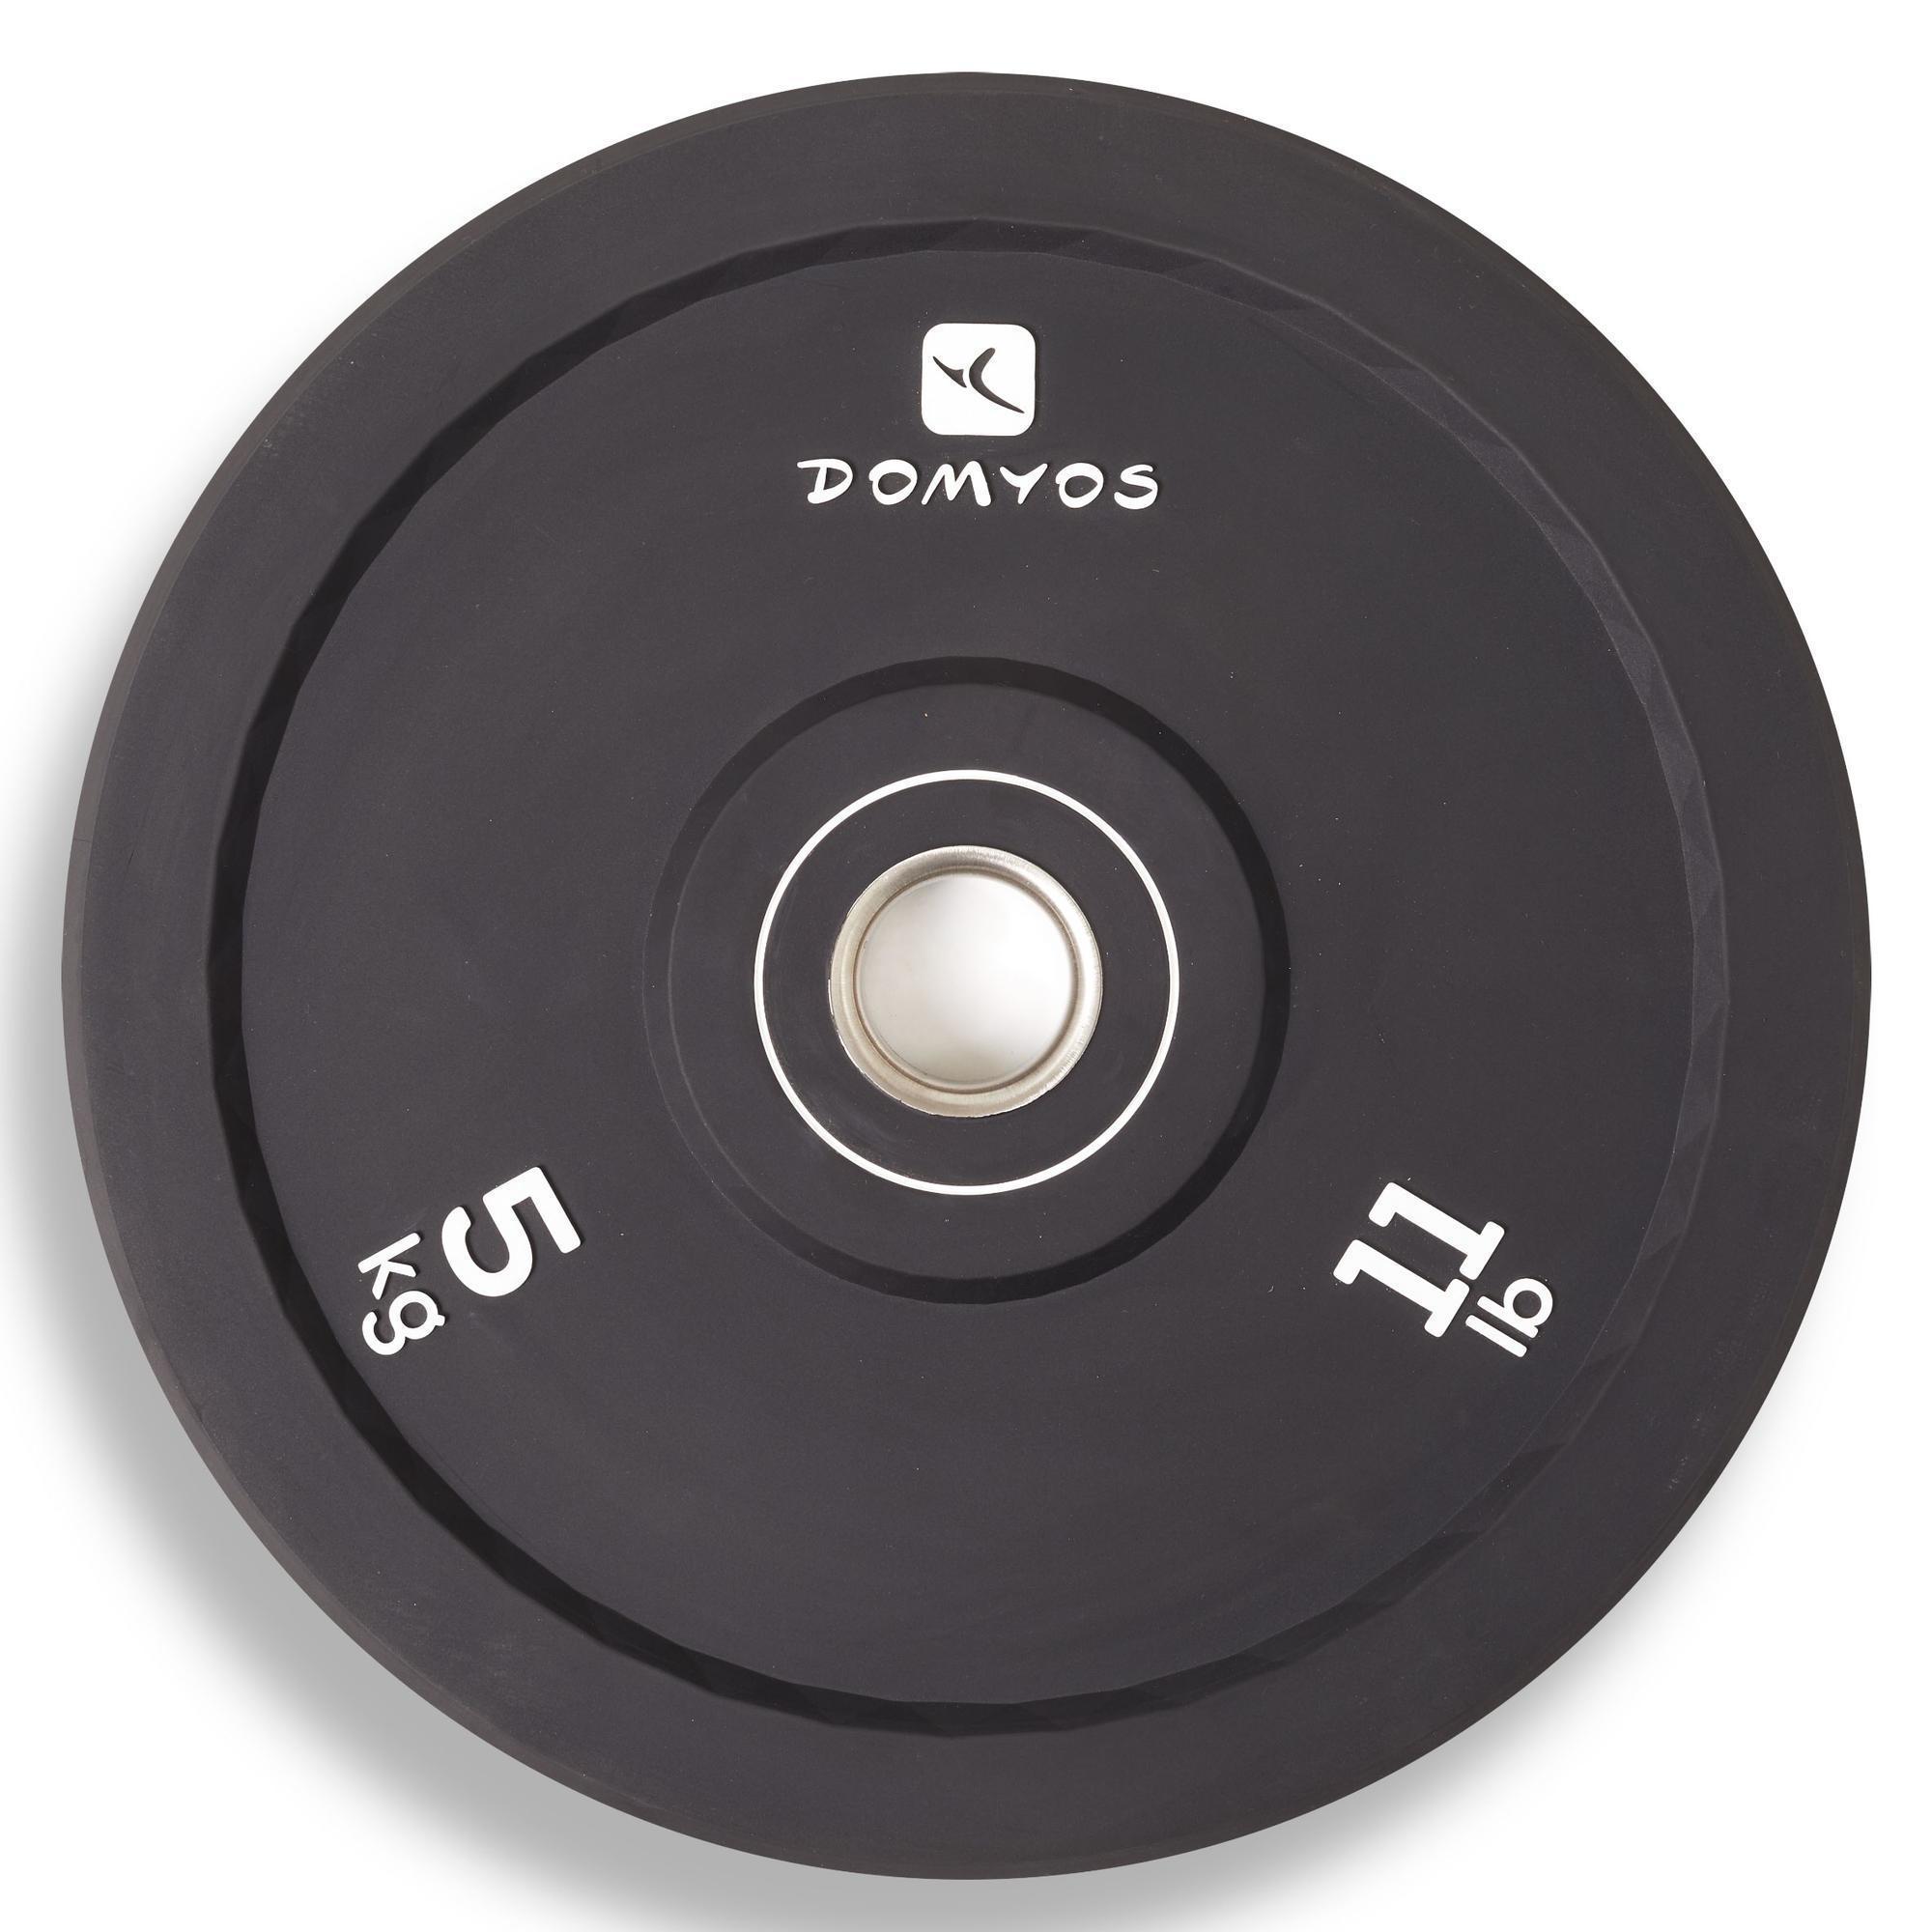 Disco bumper de halterofilia 5 kg, diámetro interior de 50 mm